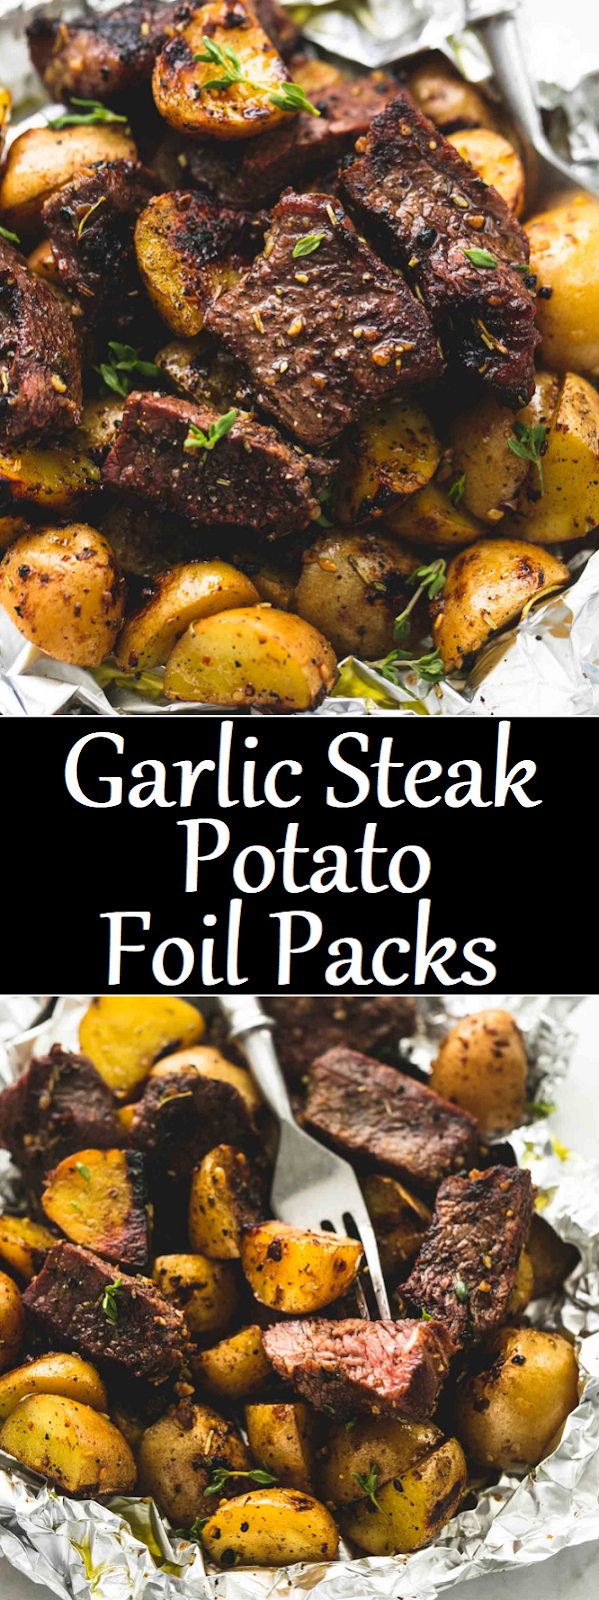 Photo of Garlic Steak and Potato Foil Packs #foods #steakrecipes #beef